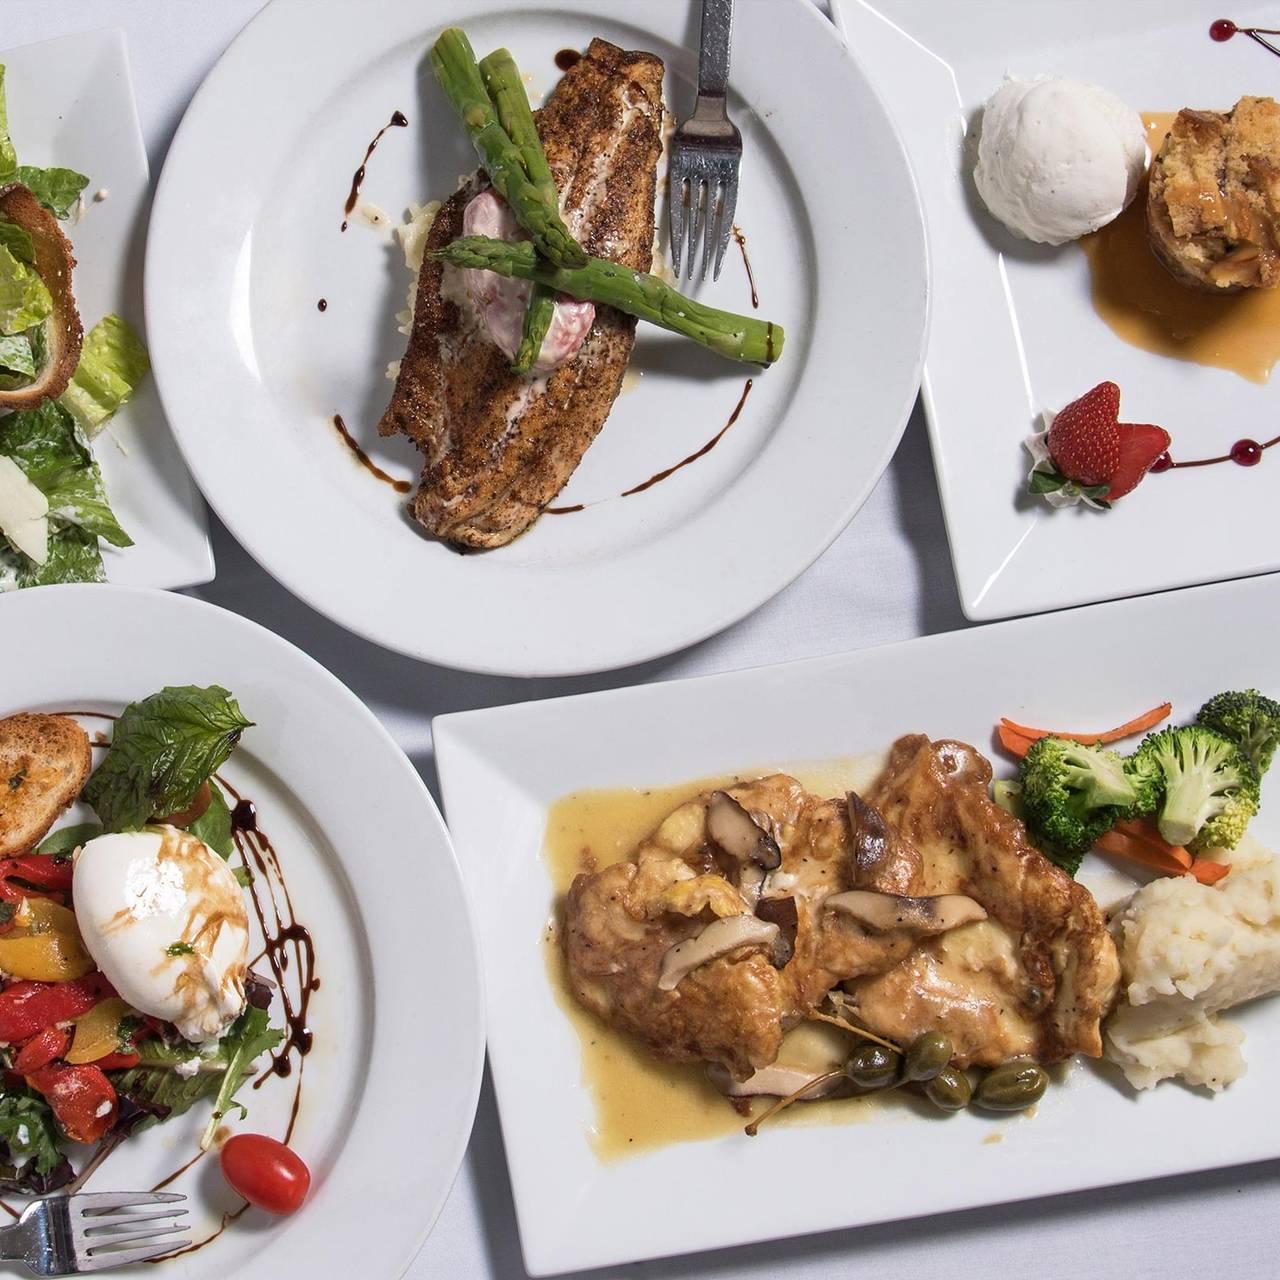 Uva - Richboro Restaurant - Richboro, PA   OpenTable